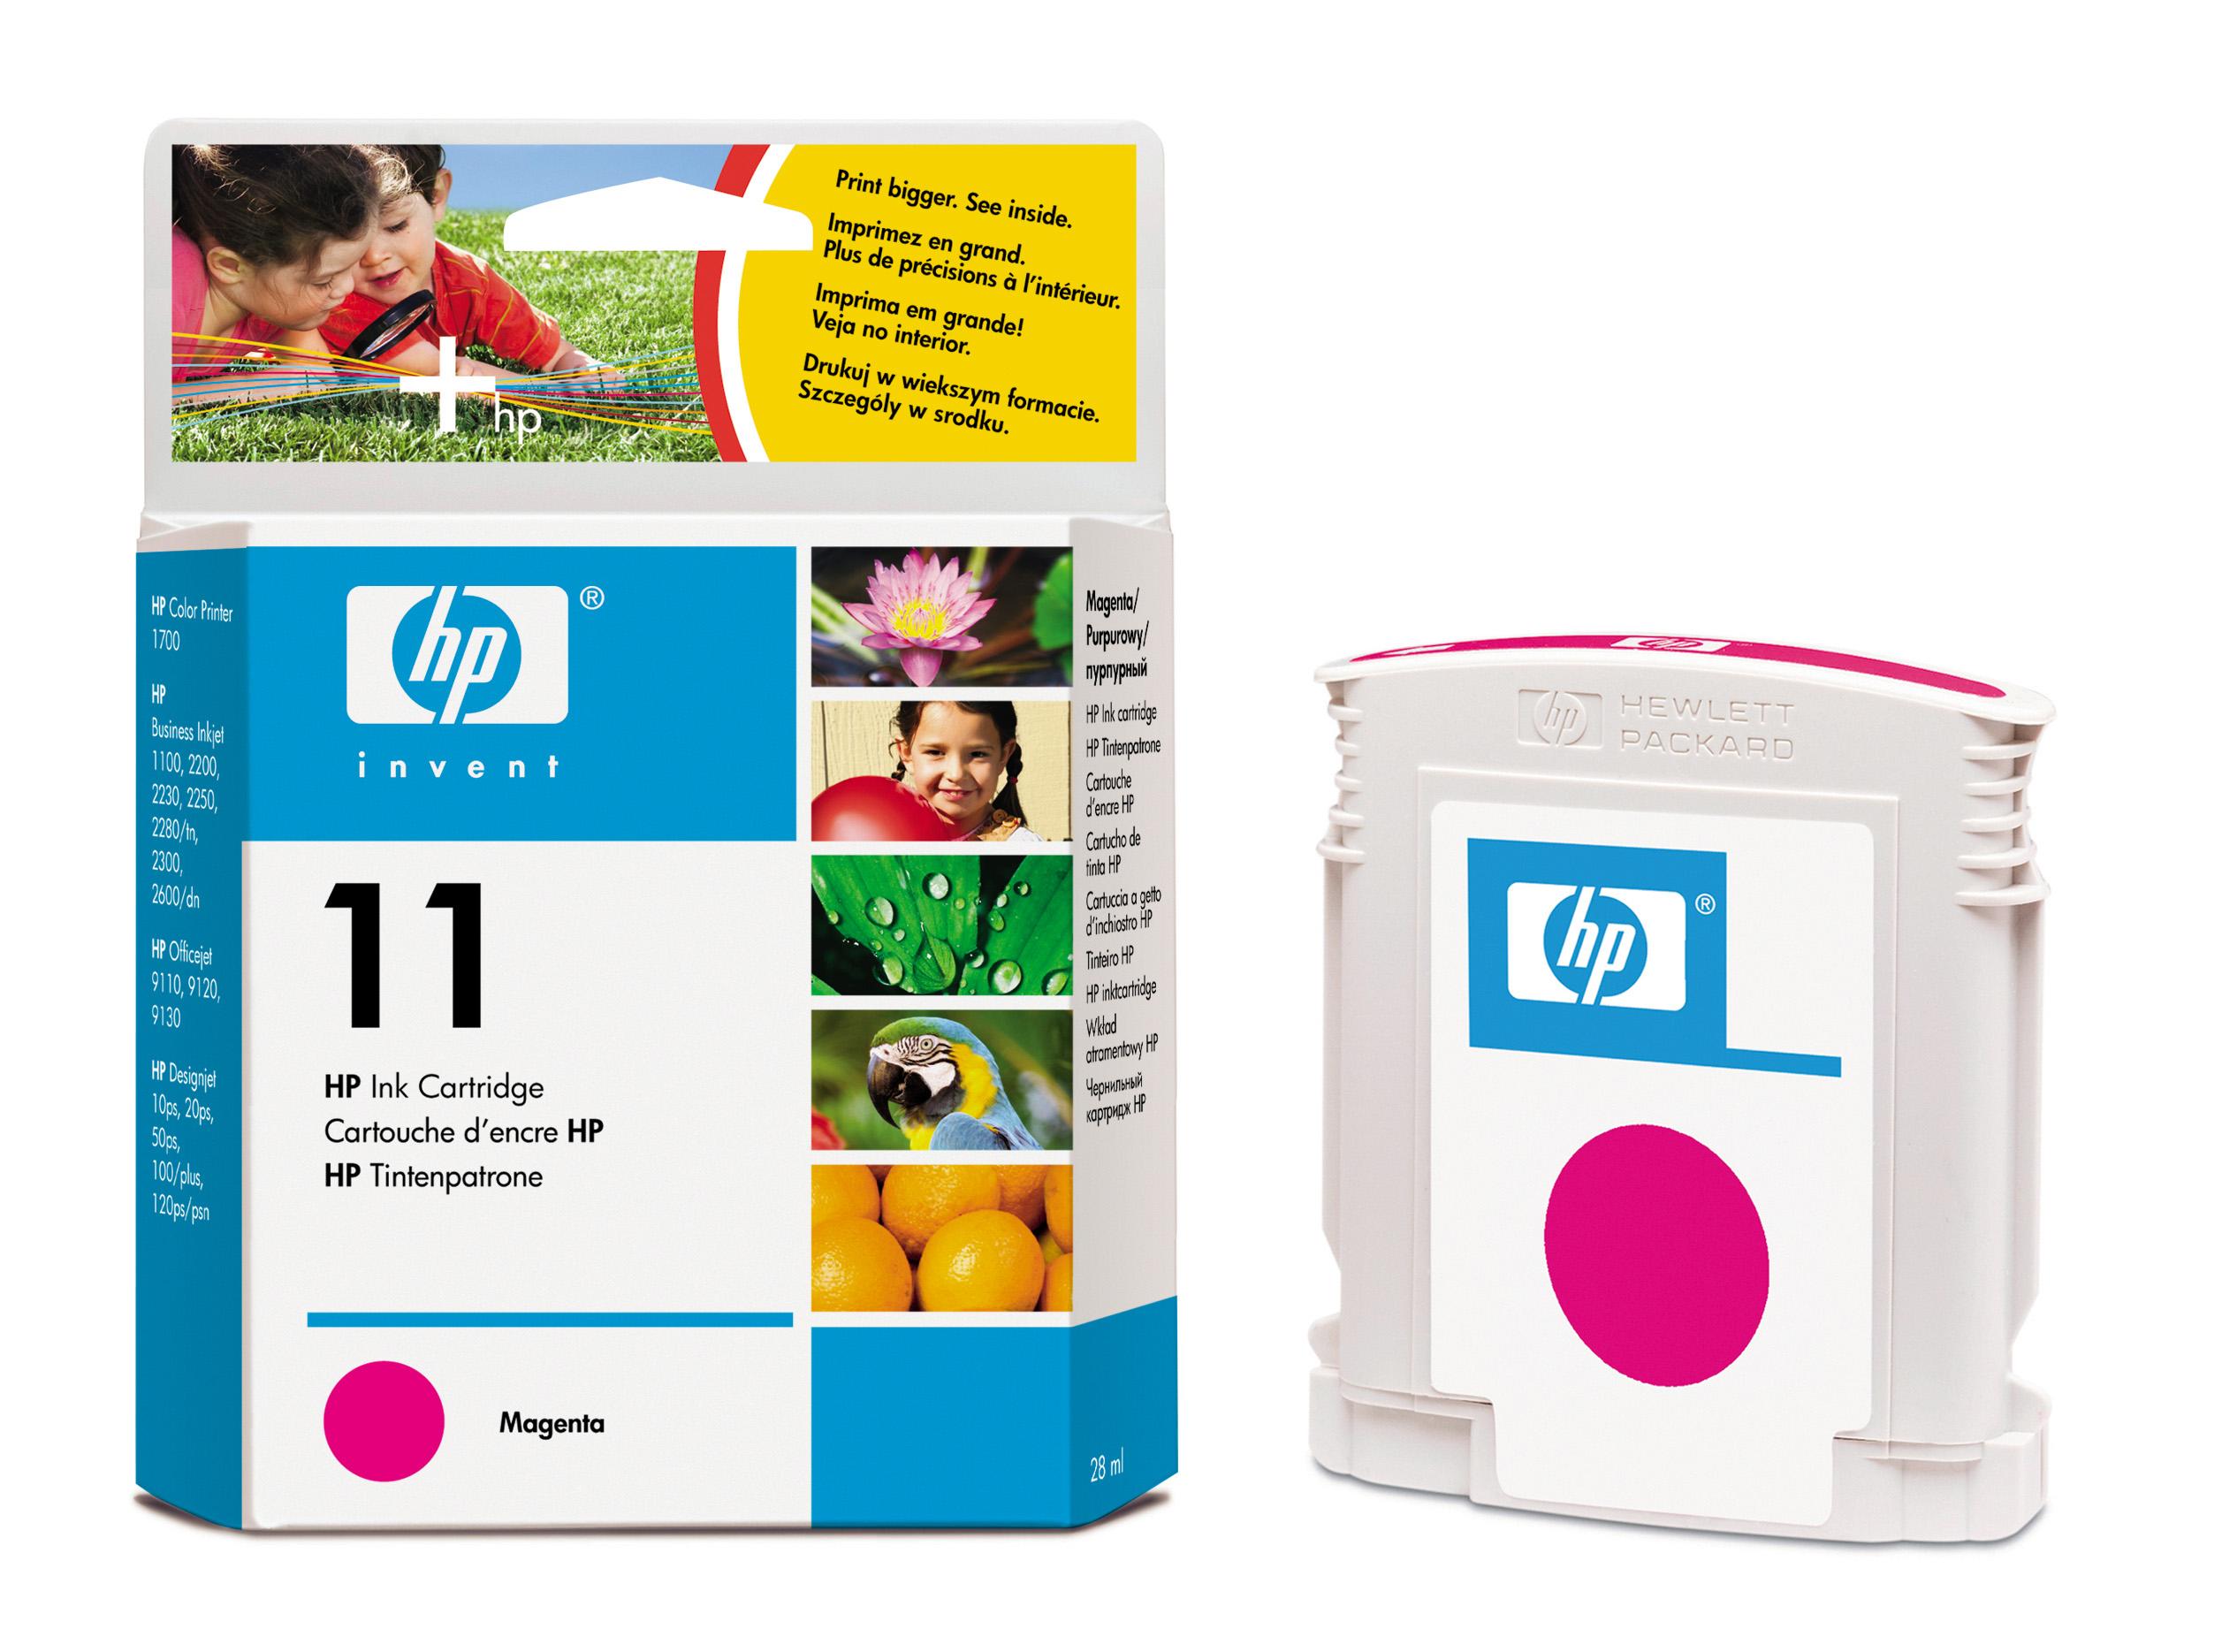 Картридж HP (C4837A) business inkjet 1000/1100d/1100dtn/1200/2200/2230/2250/2280/2300/2500/2600/2800, cp1700, DesignJet 10ps/20ps, DesignJet 70/100/110plus/111, OfficeJet 9110/9120/9130, OfficeJet Pro K850 series Magenta